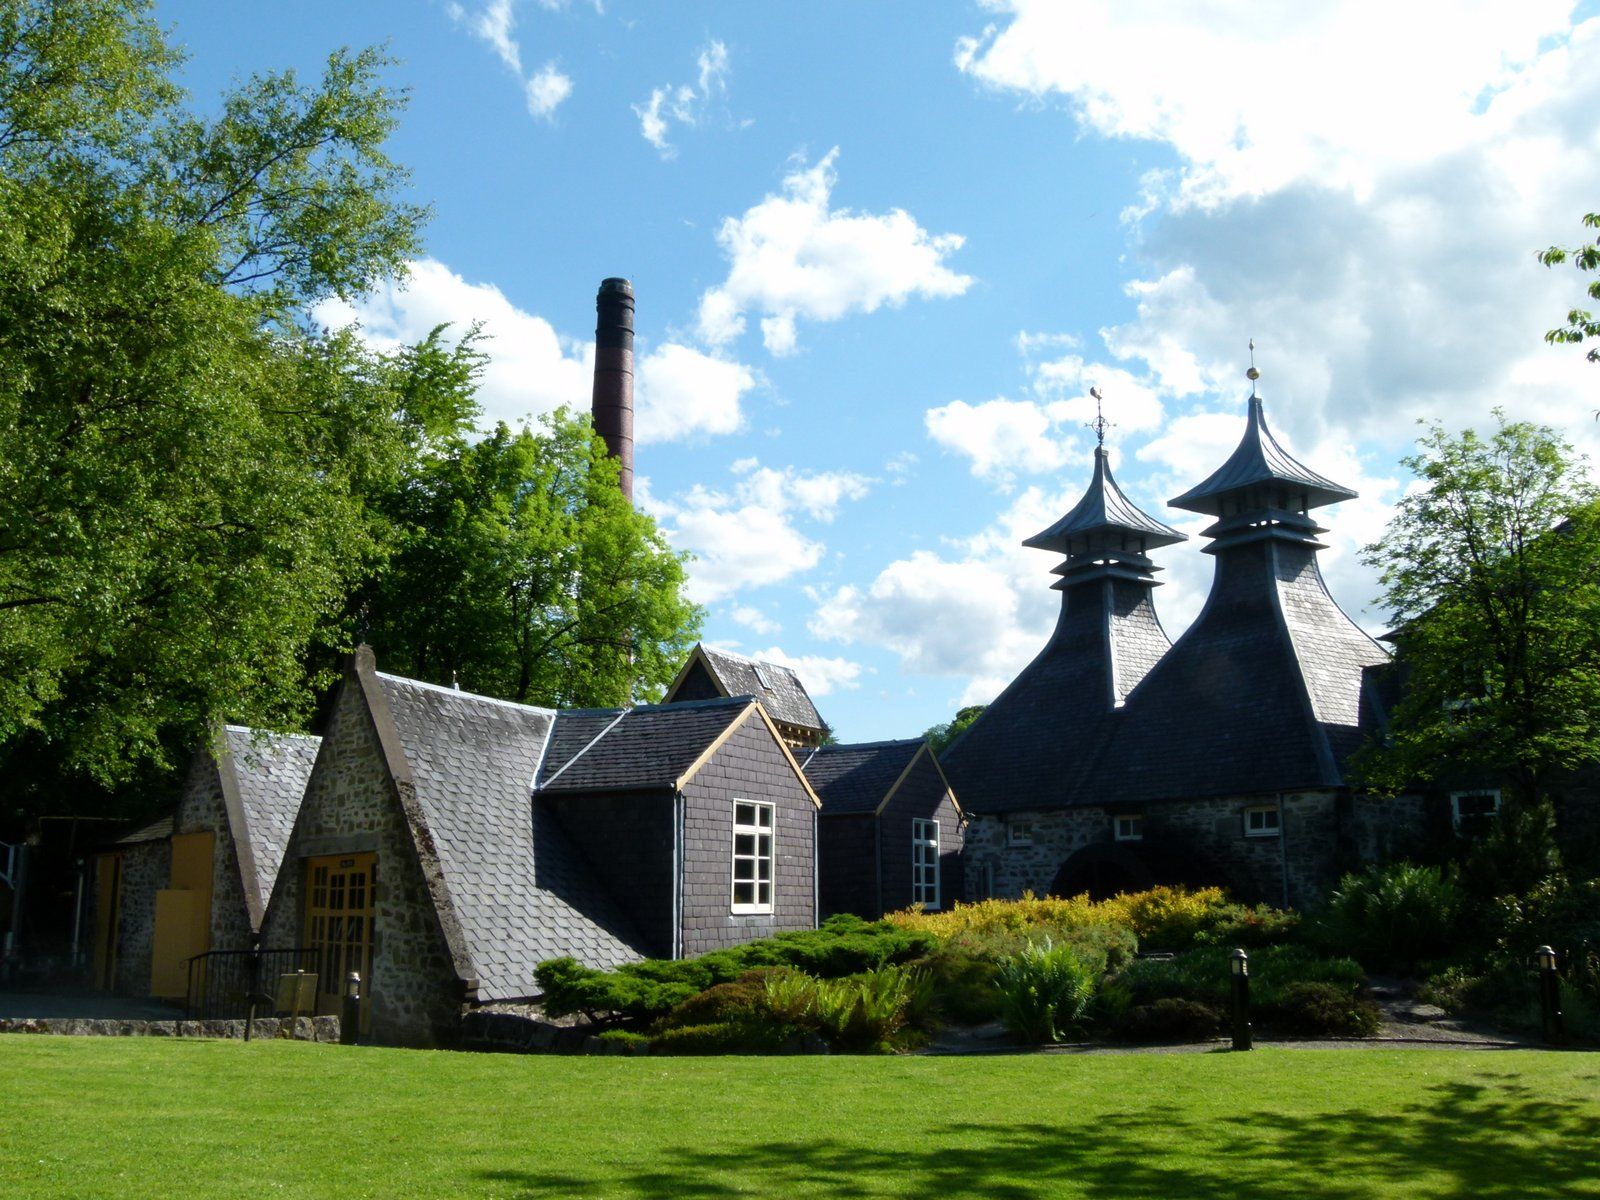 Strathisla Distillery near Keith, Moray